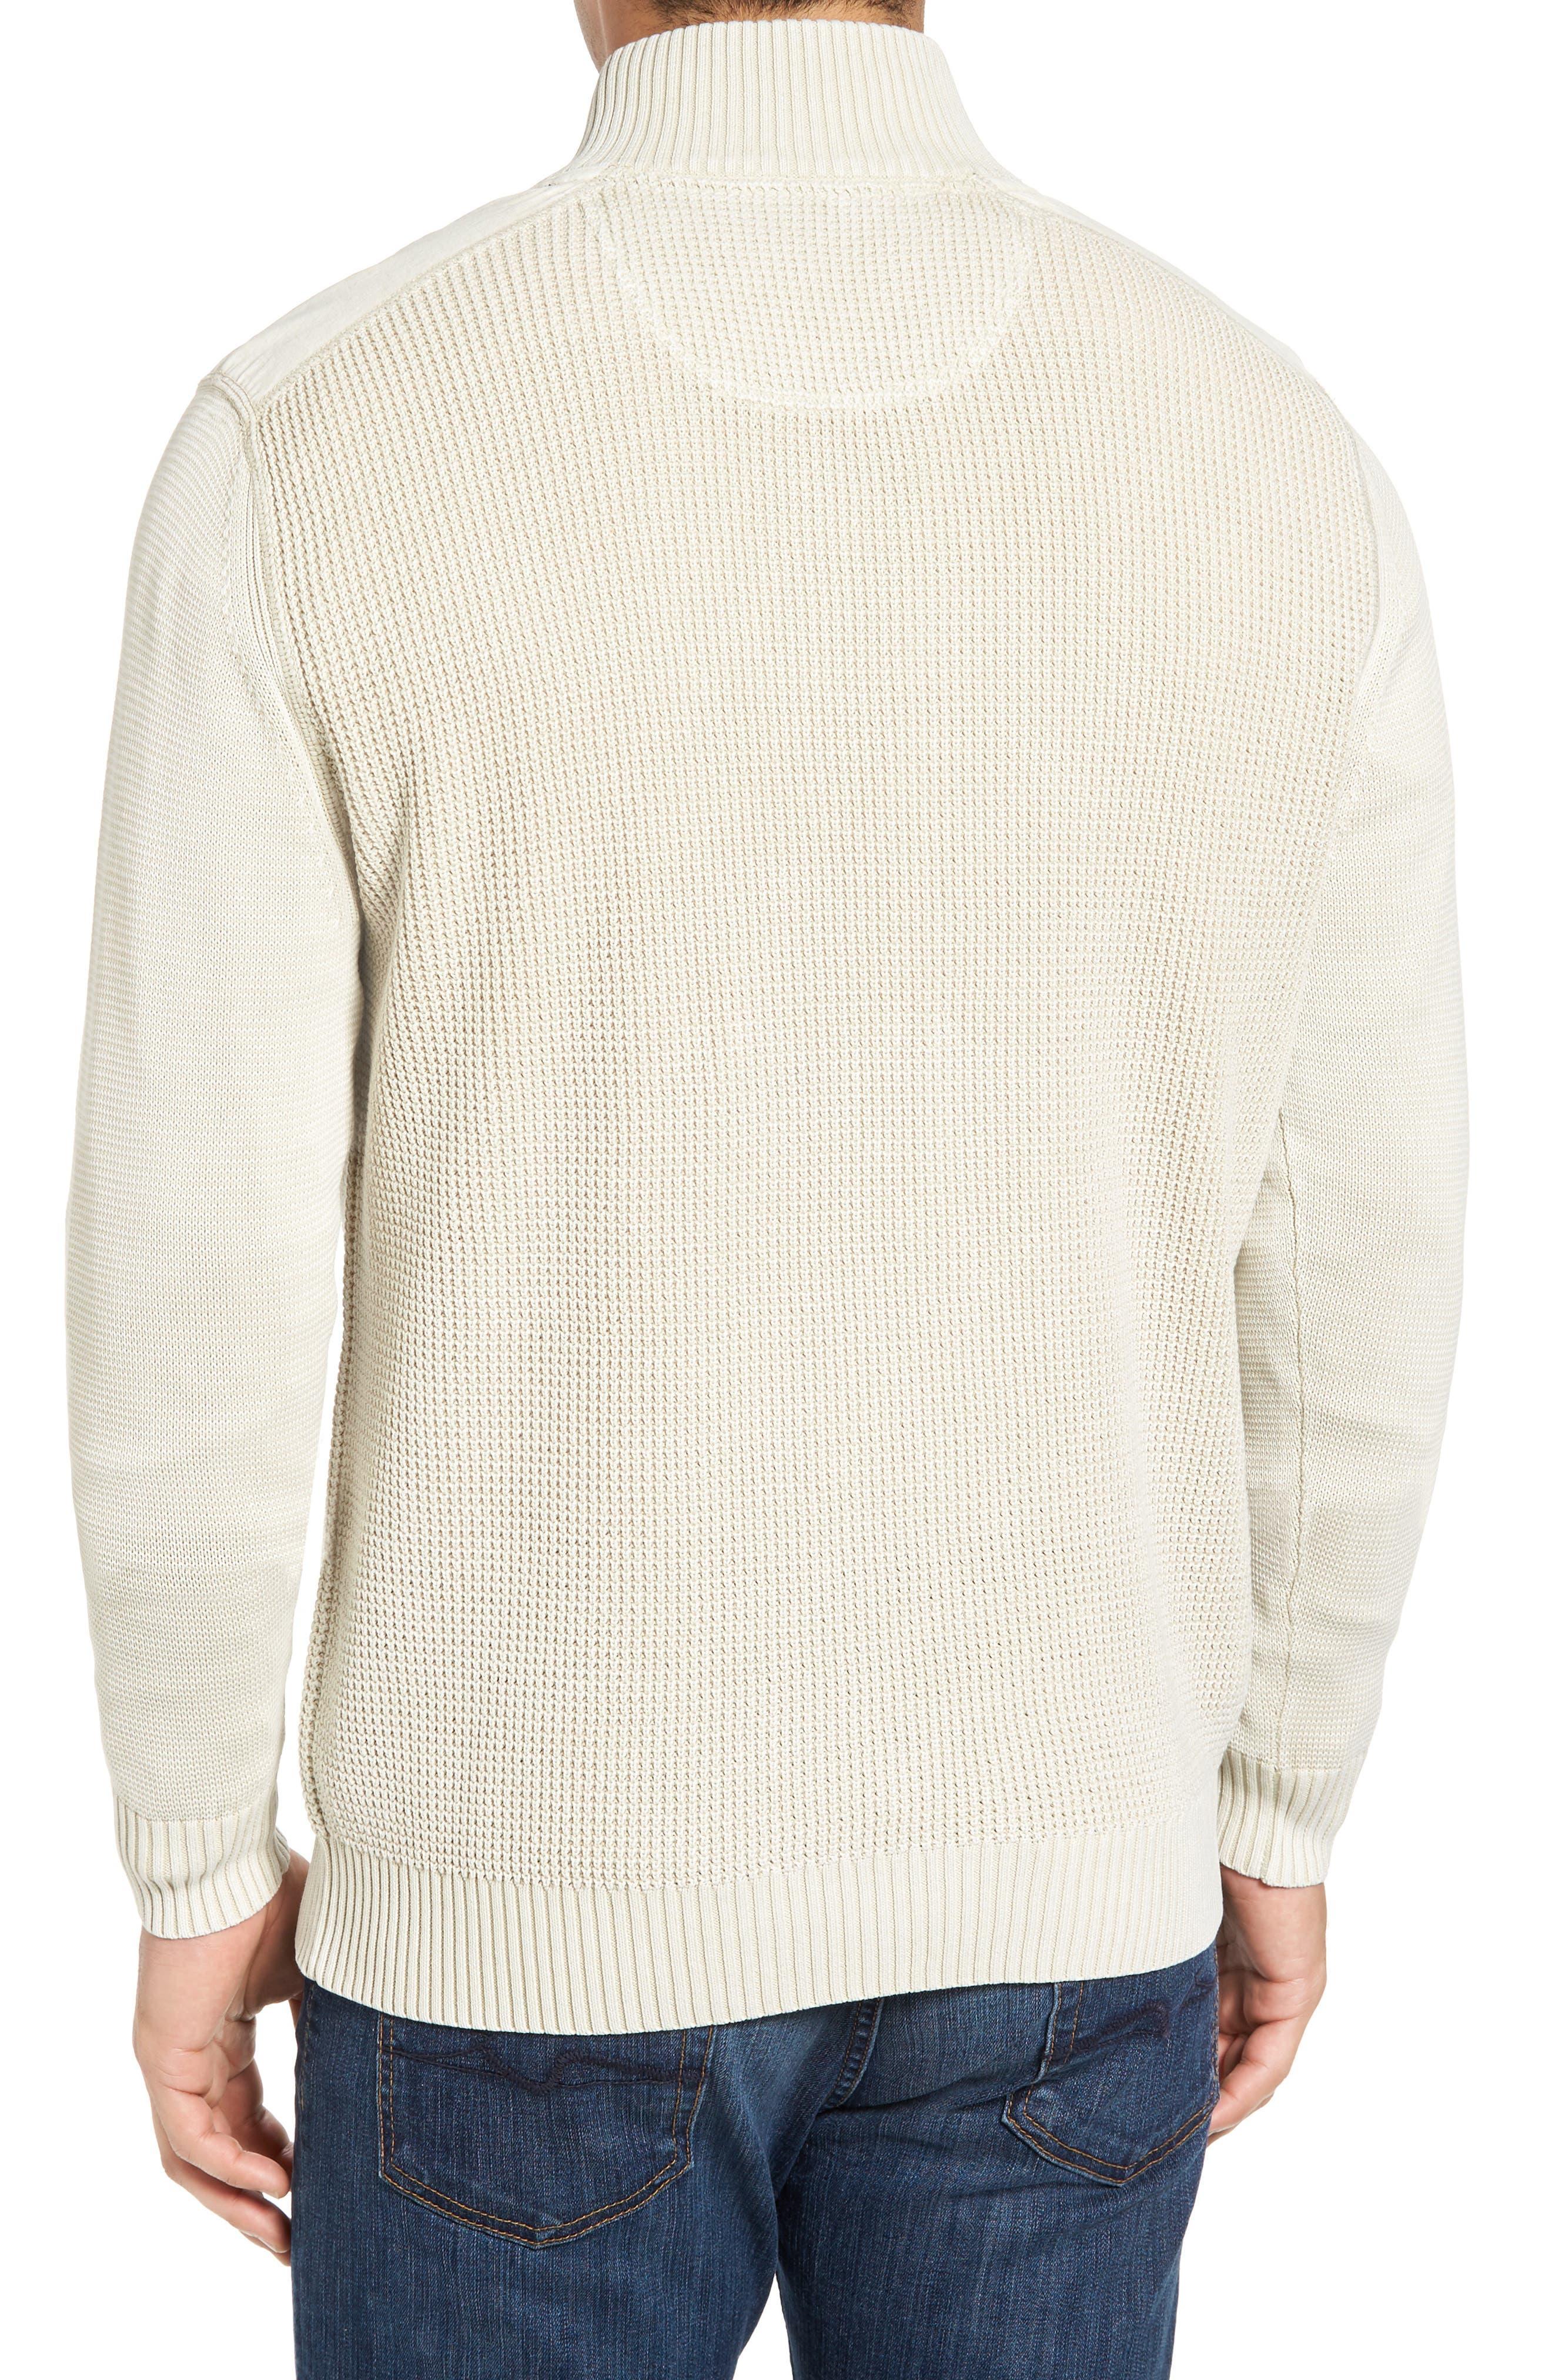 'Coastal Shores' Quarter Zip Sweater,                             Alternate thumbnail 16, color,